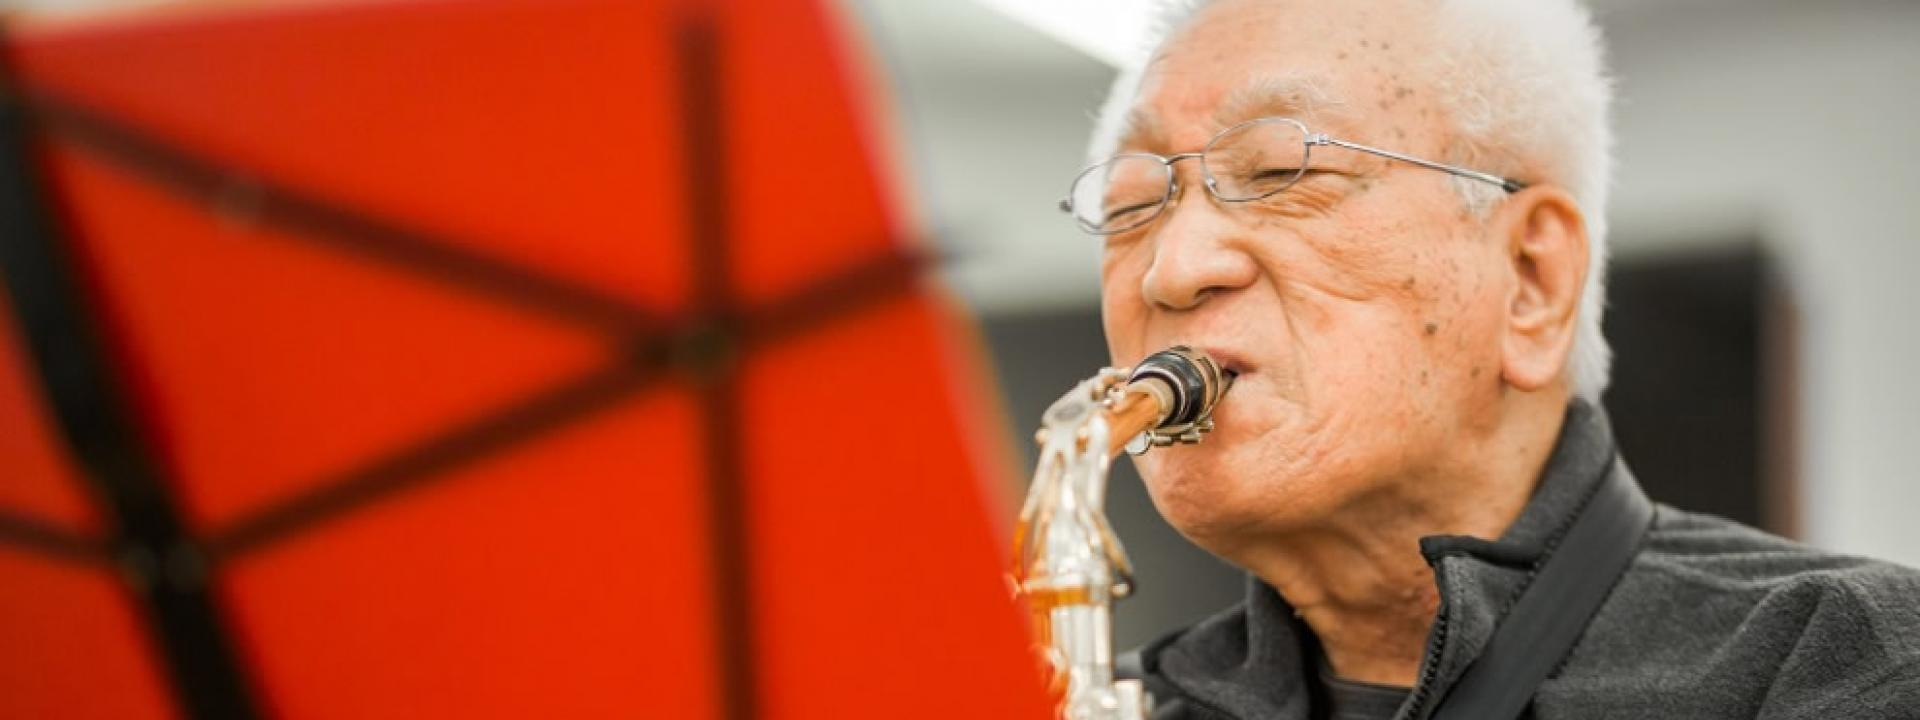 Man play the saxophone.